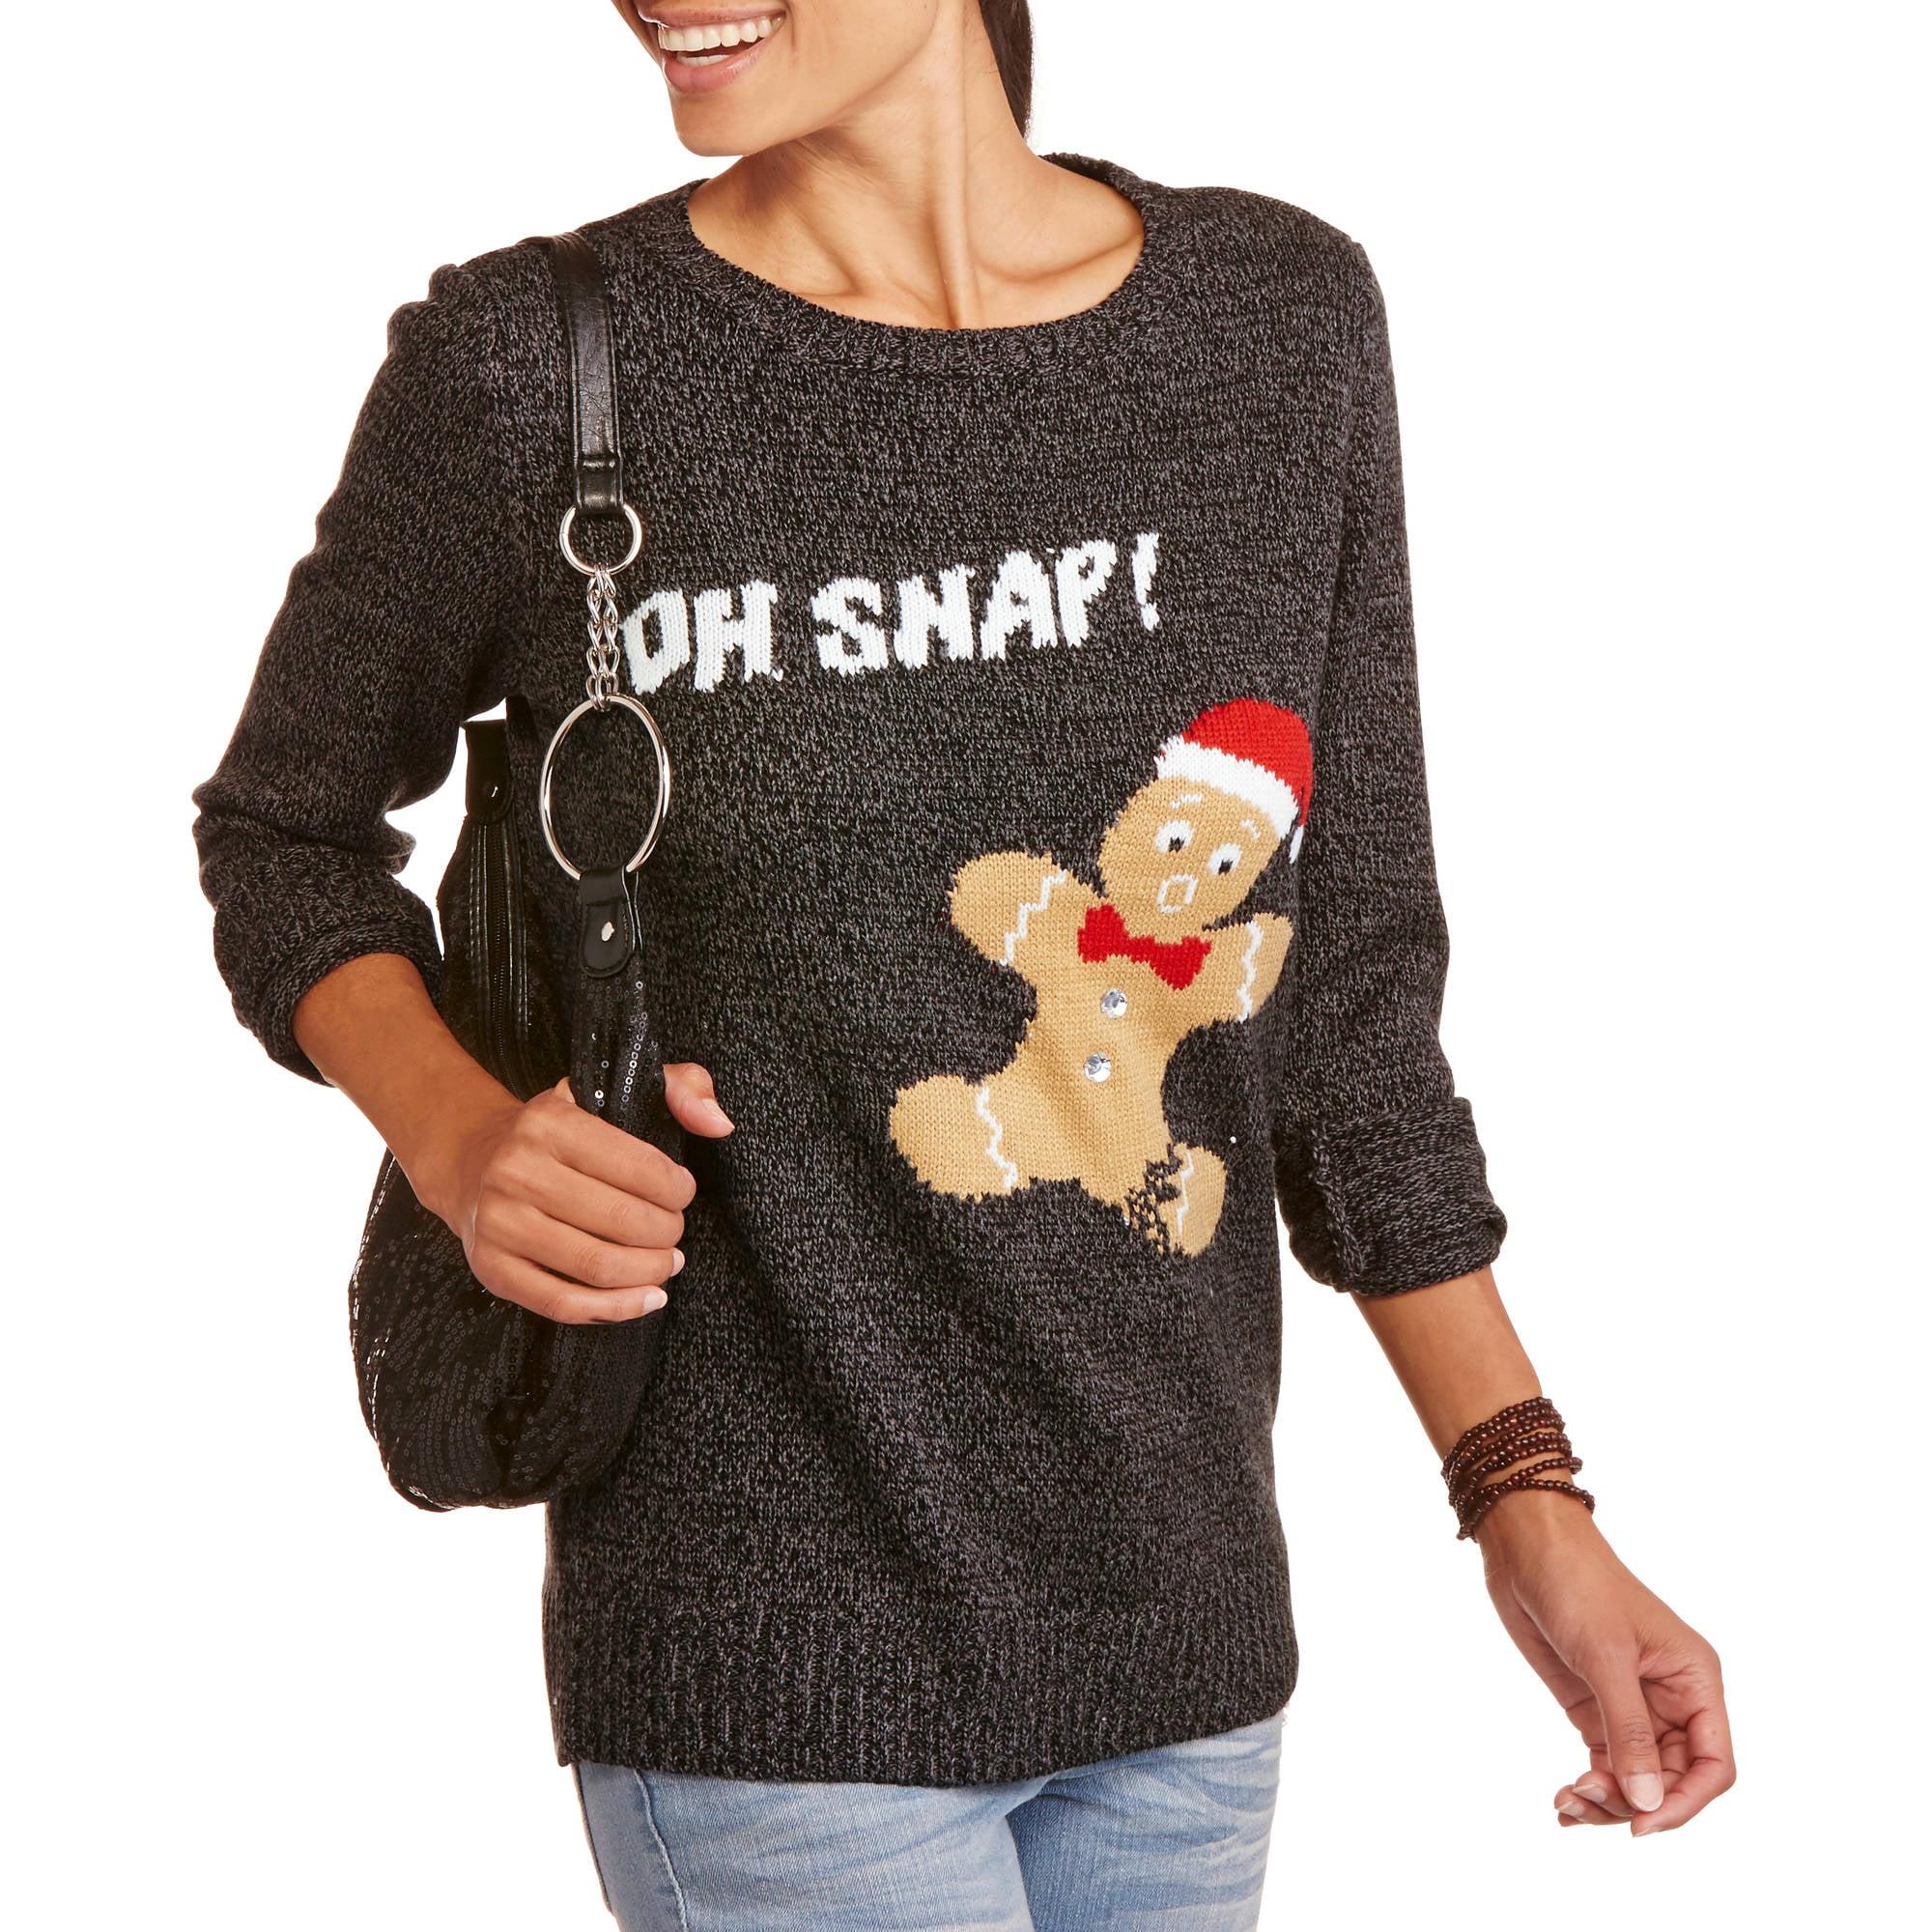 oh snap christmas sweater - wlrtradio.com